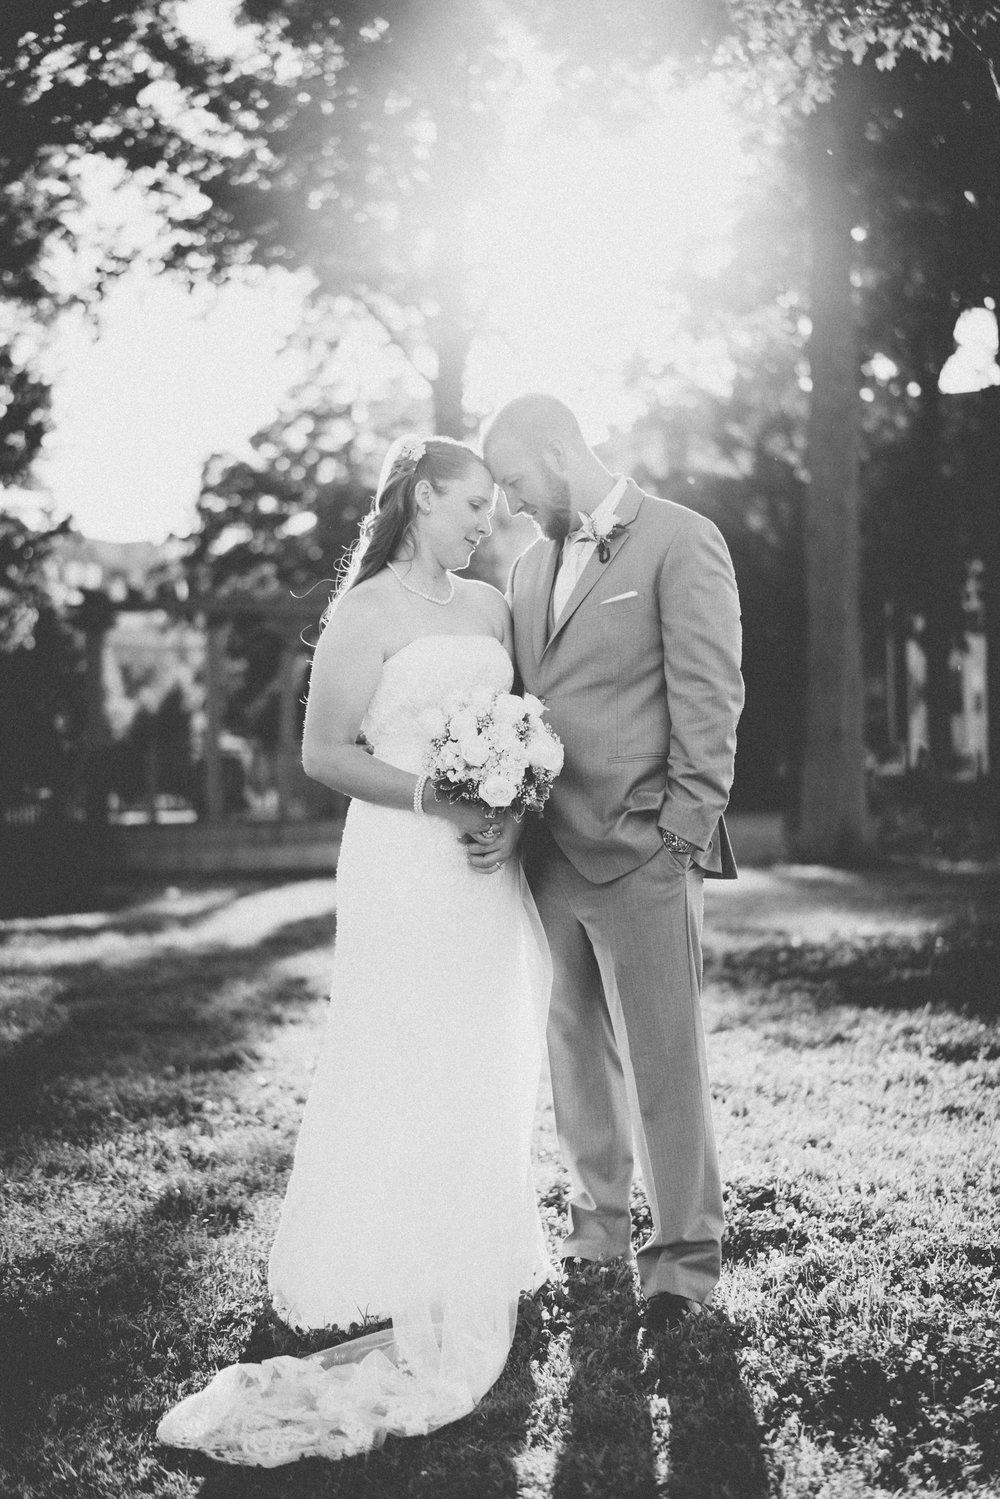 Mike_Steinmetz_Virginia_Wedding_Photographer_Favorites-19.jpg